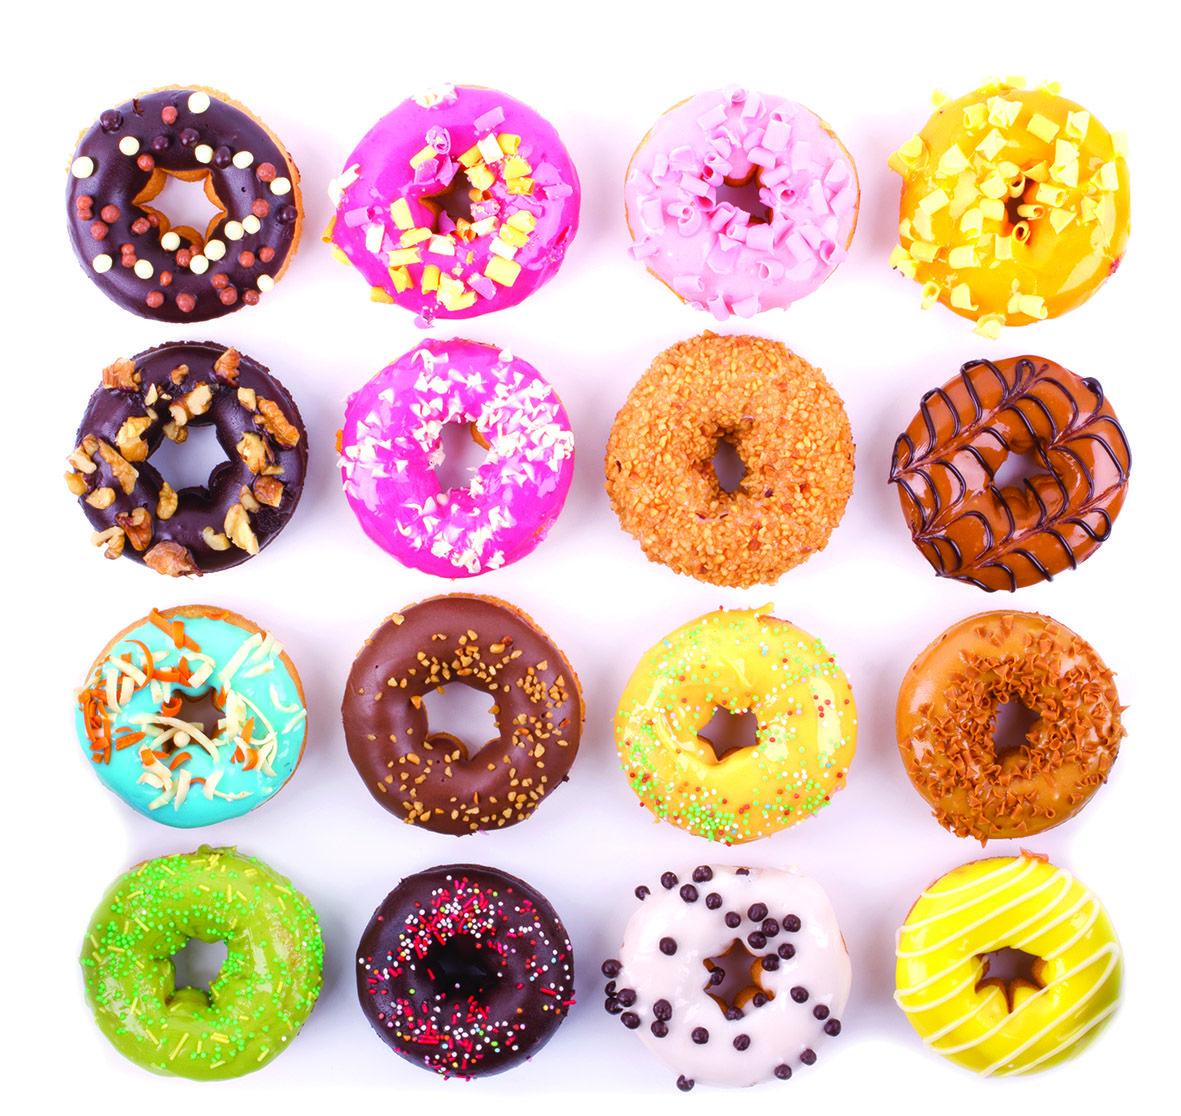 Decorated_Doughnuts_5